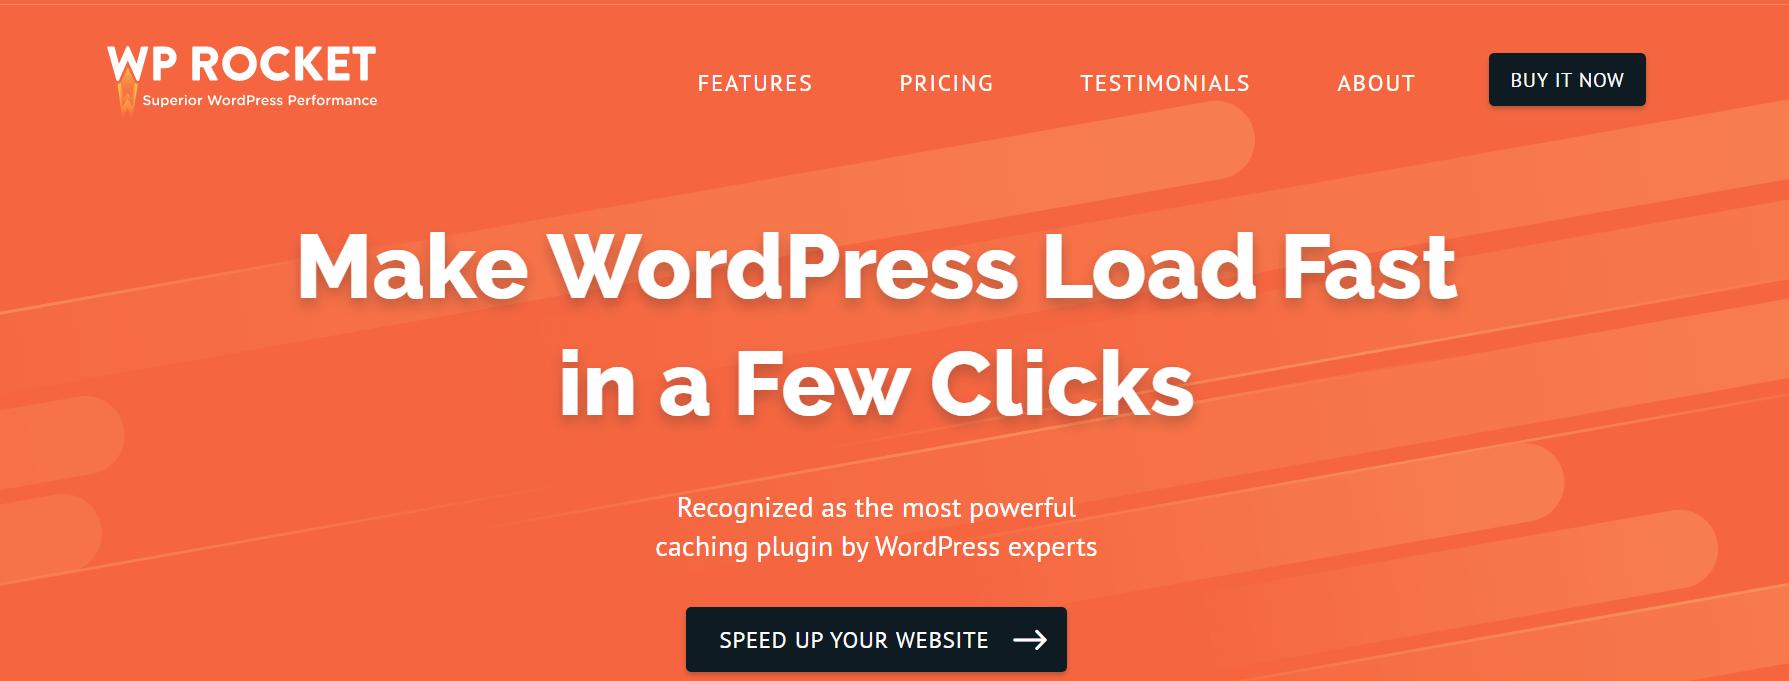 WP Rocket插件是博主必备的WordPress插件。